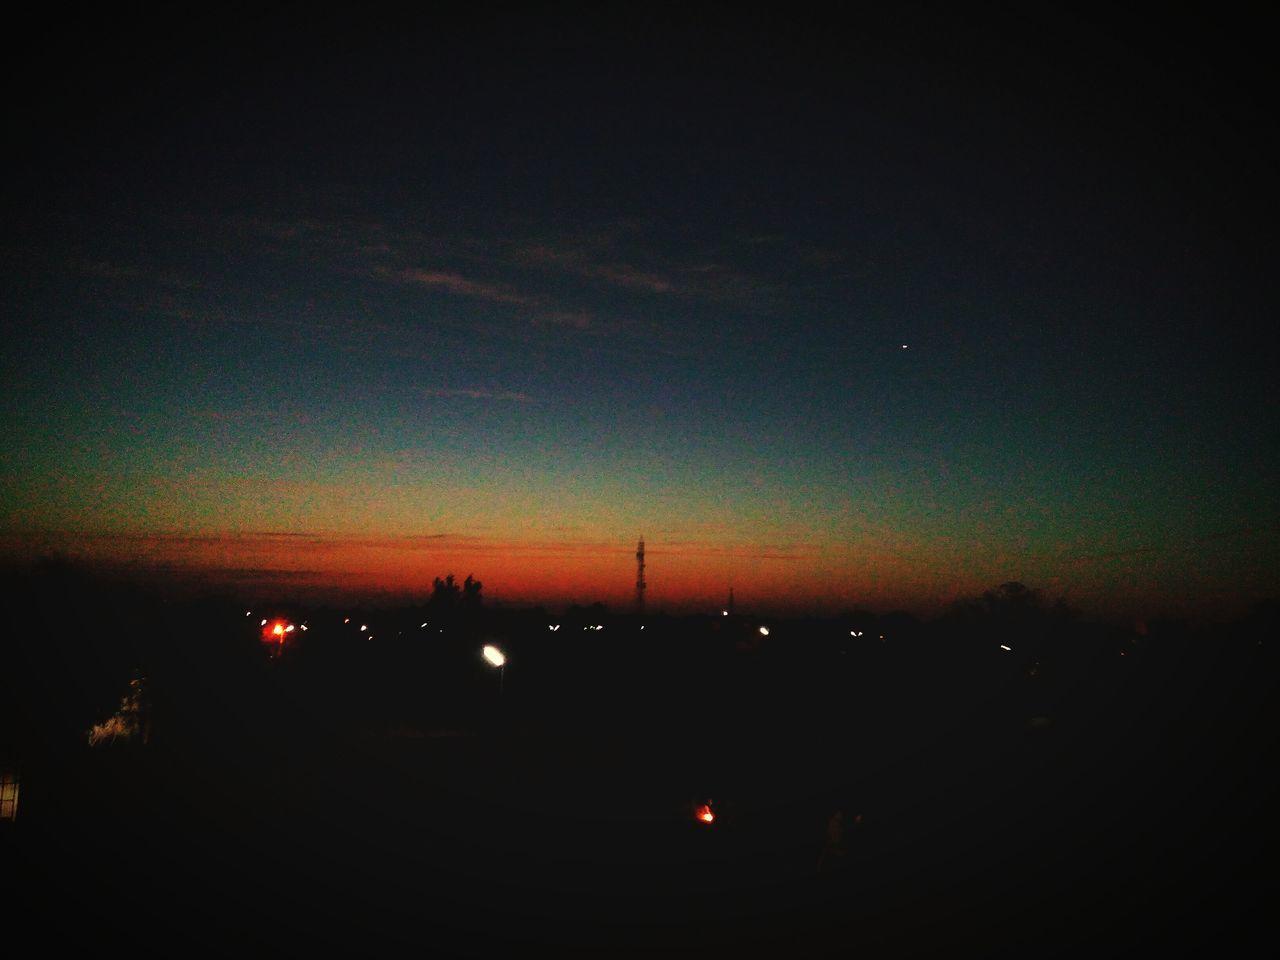 dark, night, silhouette, sky, sunset, nature, no people, illuminated, beauty in nature, outdoors, scenics